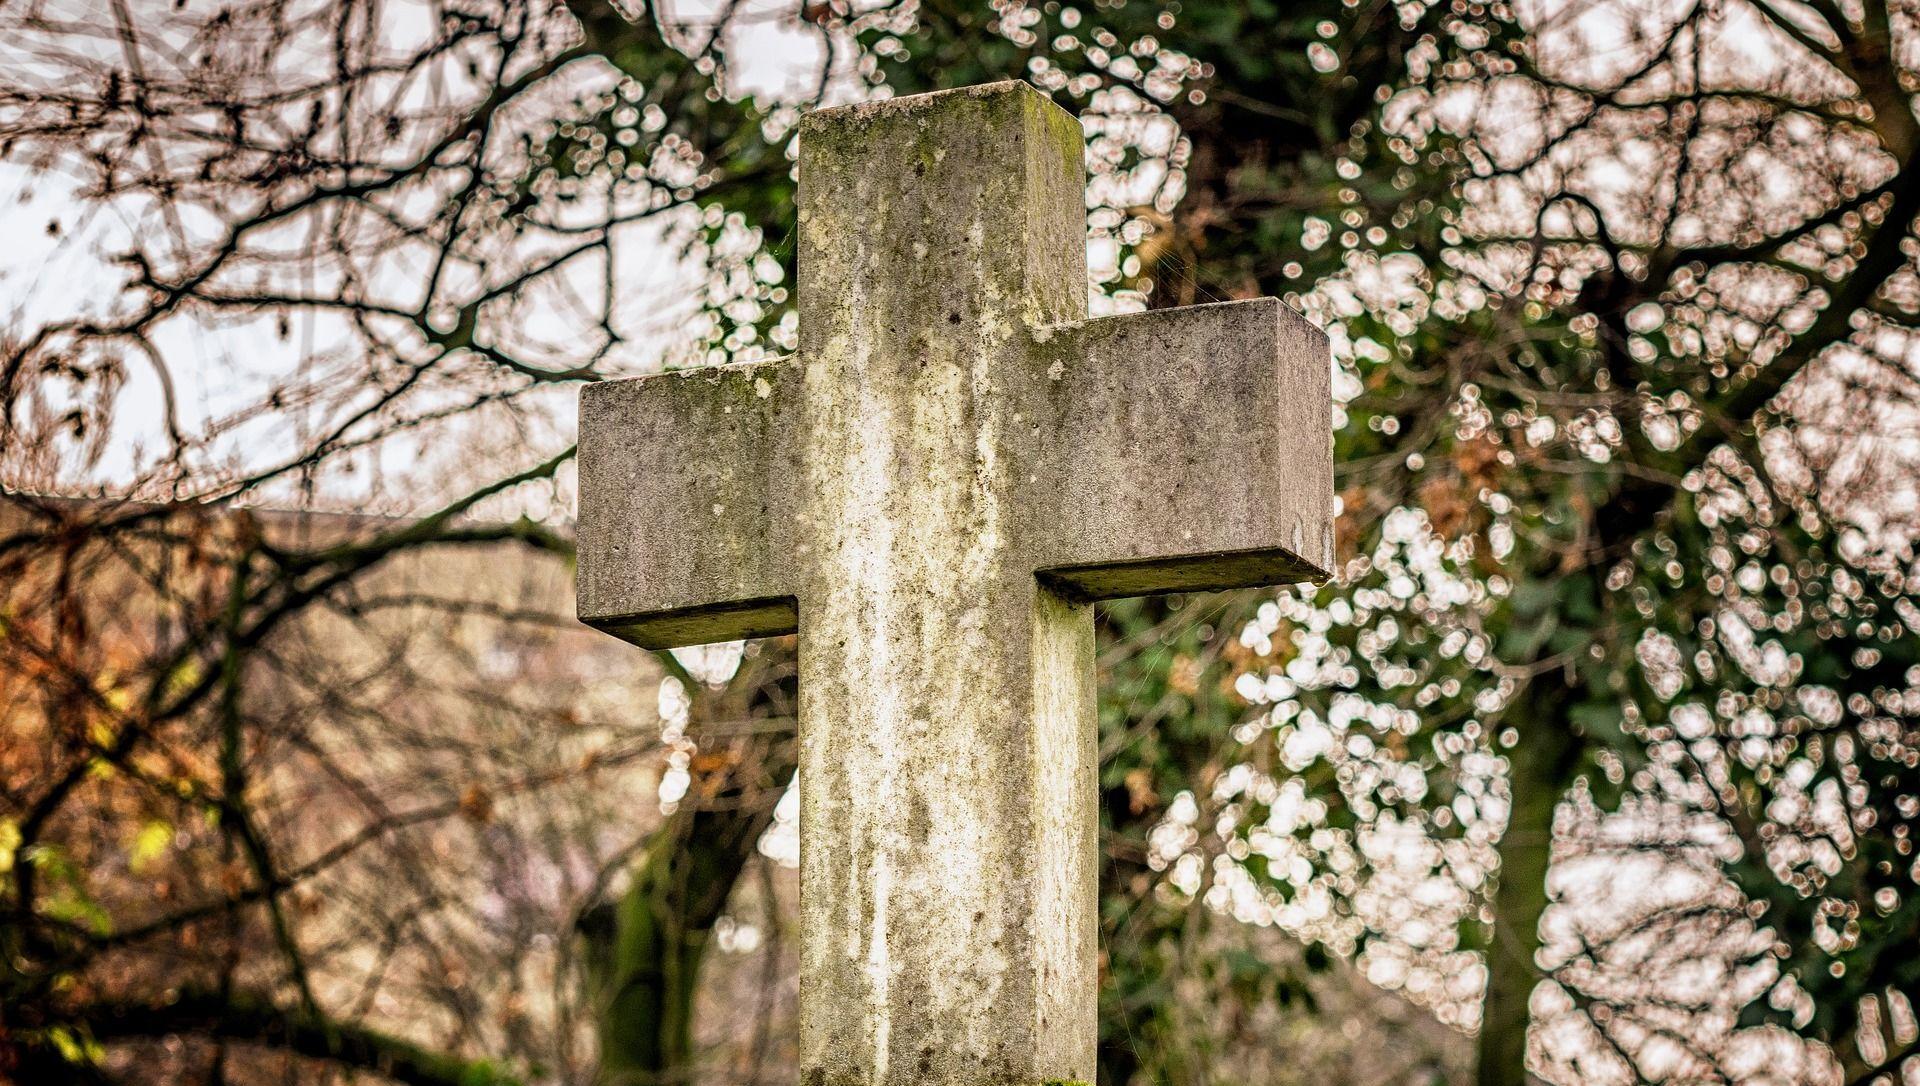 Una croce al cimitero - Sputnik Italia, 1920, 21.02.2021